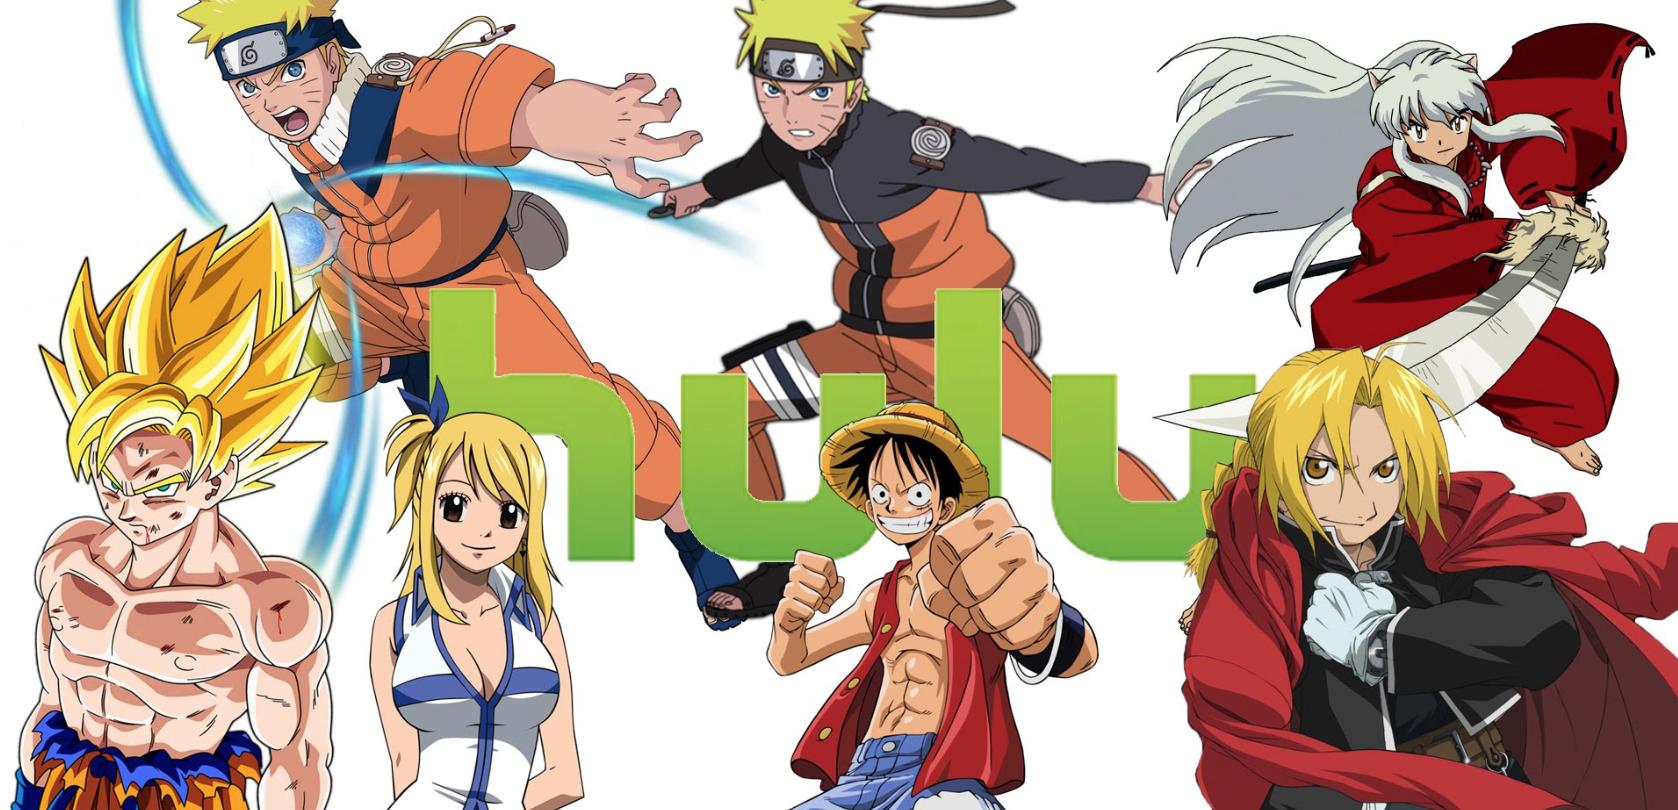 huluのアニメのススメ hulu フールー で見れるアニメ一覧 akatsukigo